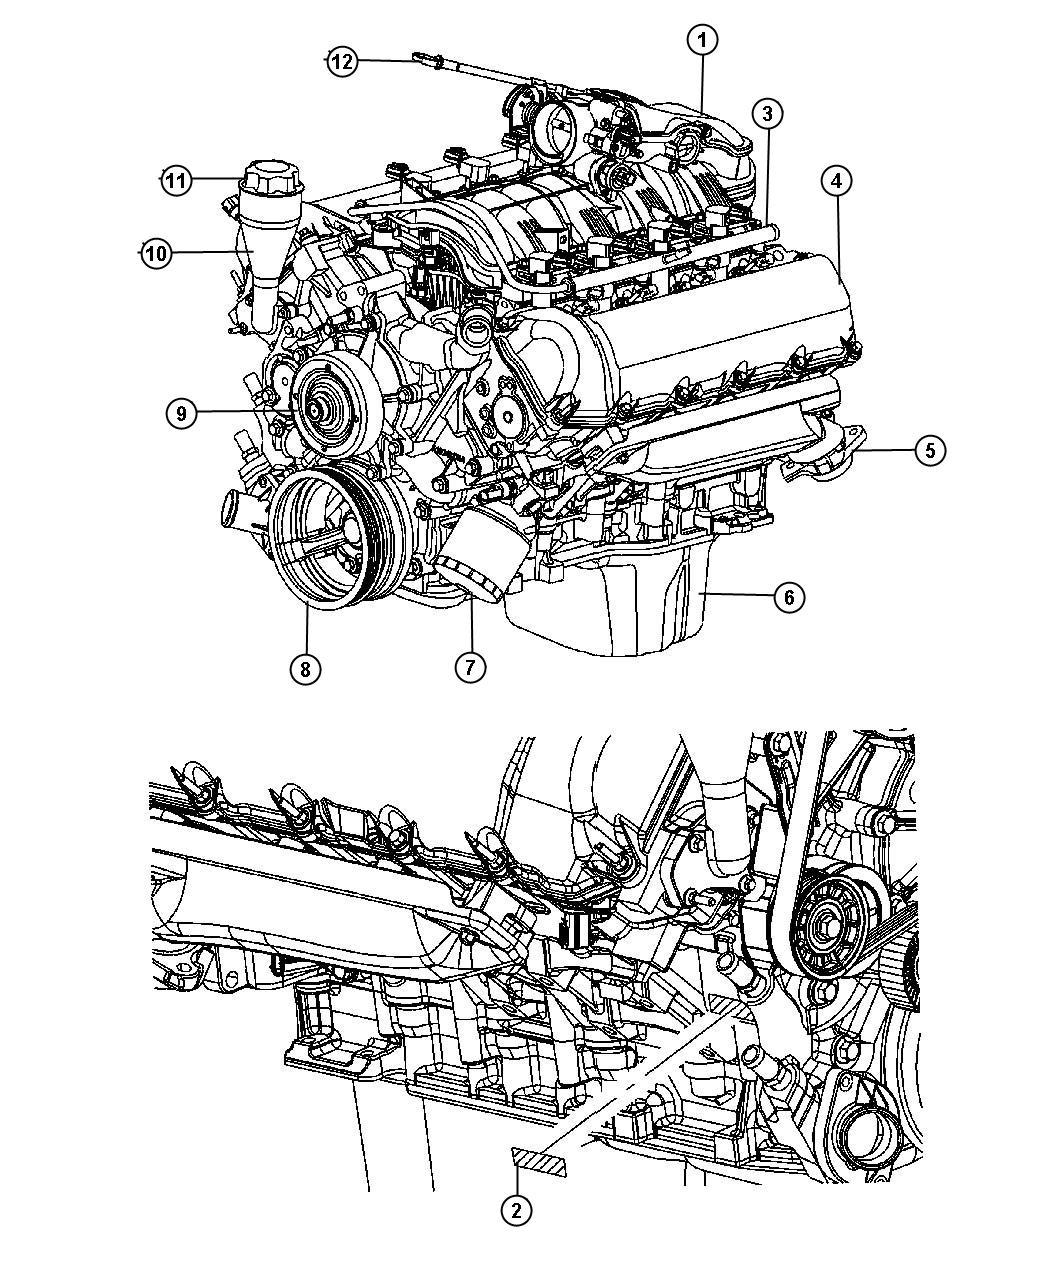 Dodge Ram Manifold Exhaust Left Eva Intake